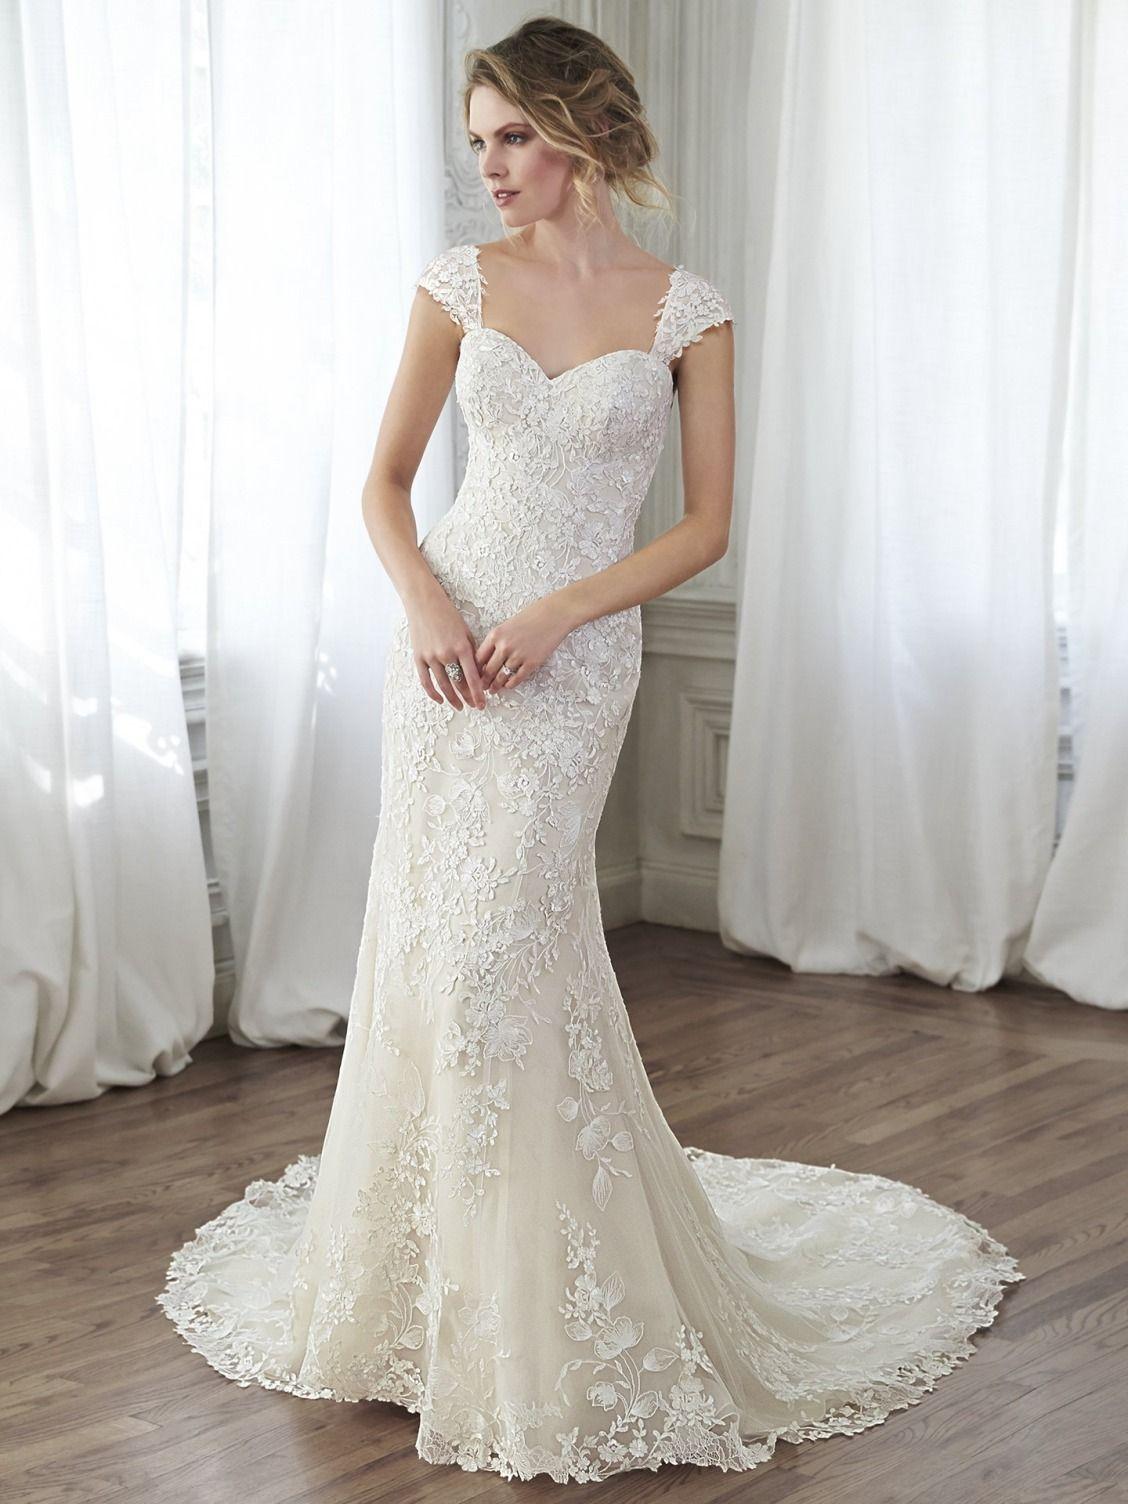 Best Wedding Dress Designers 2016 Ficts